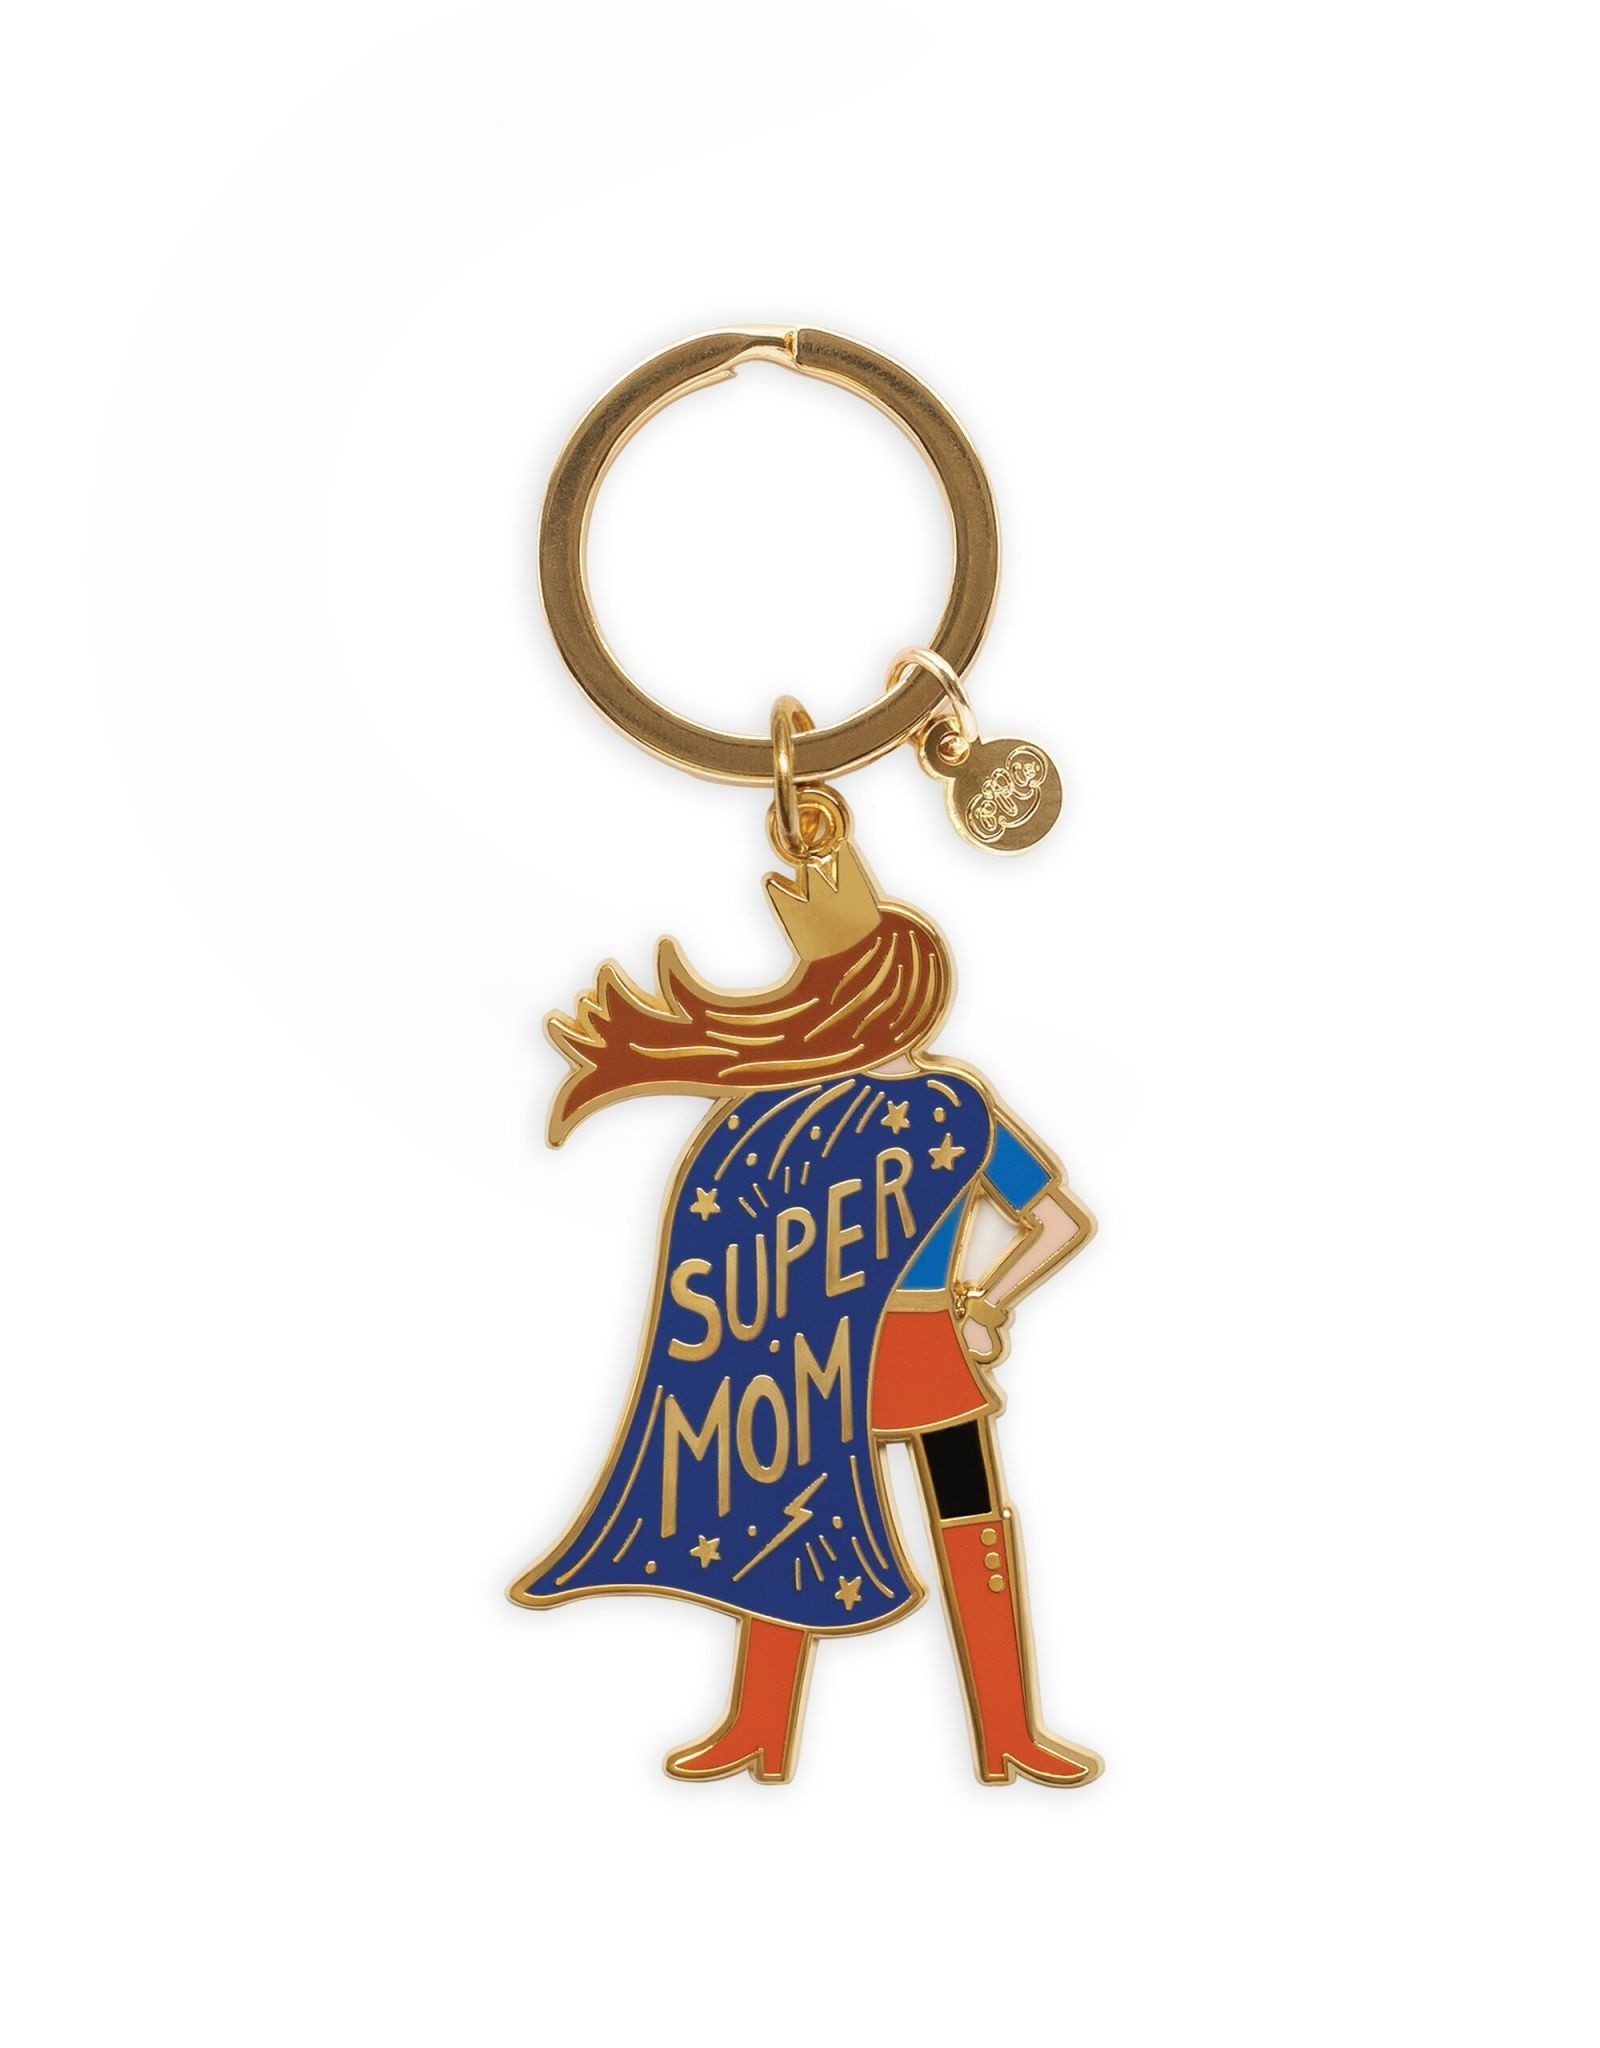 RIFLE PAPER COMPANY KEYCHAIN ENAMEL SUPER MOM